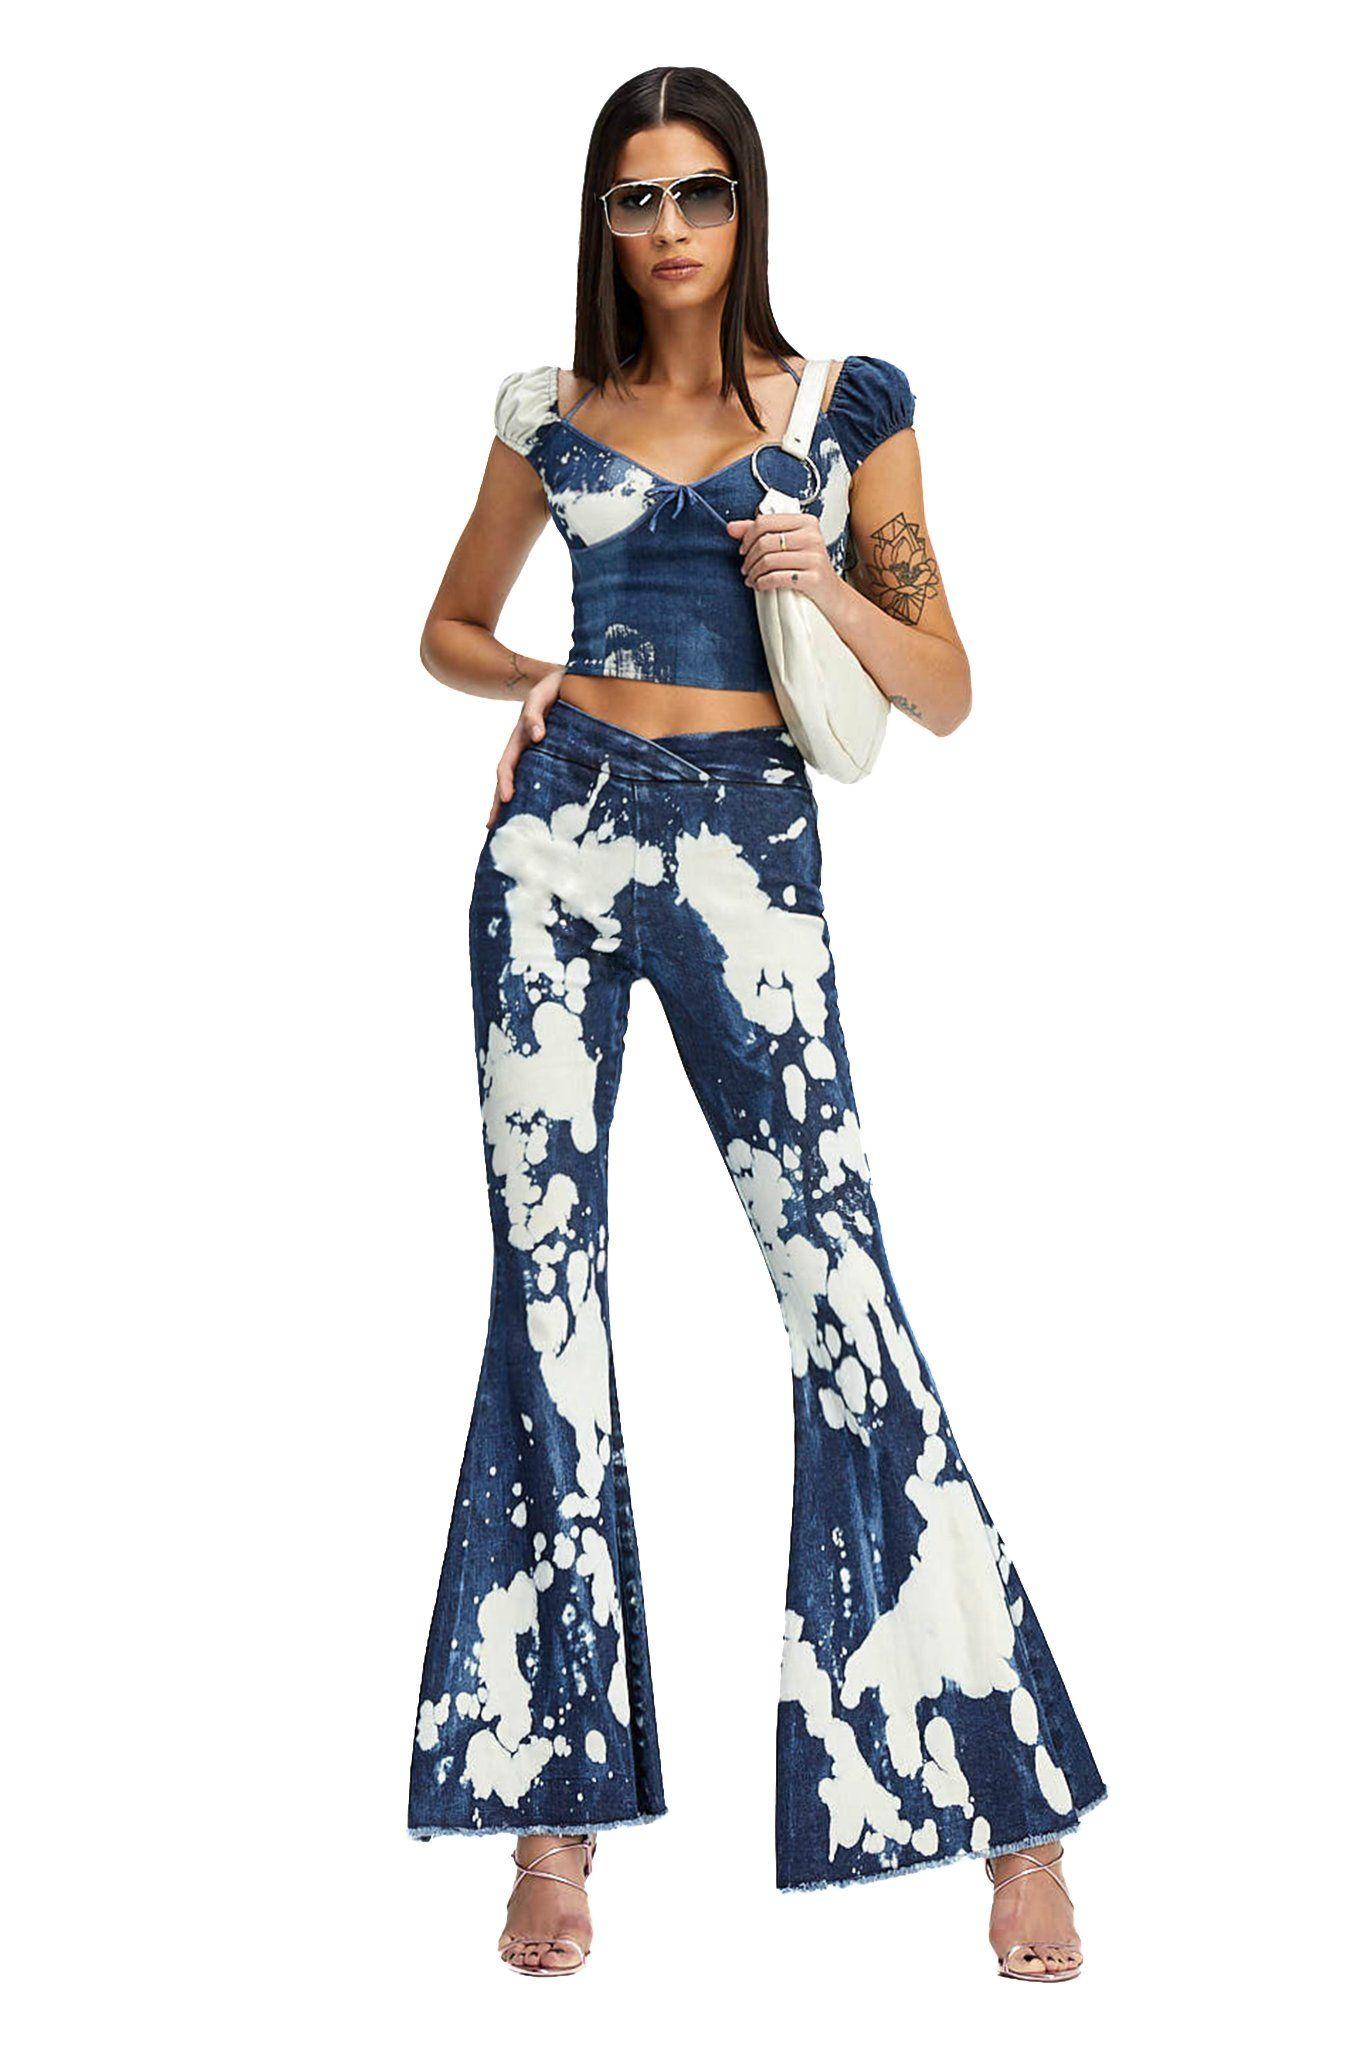 DESPINA TOP in 2021 Fashion inspo outfits, Denim fashion